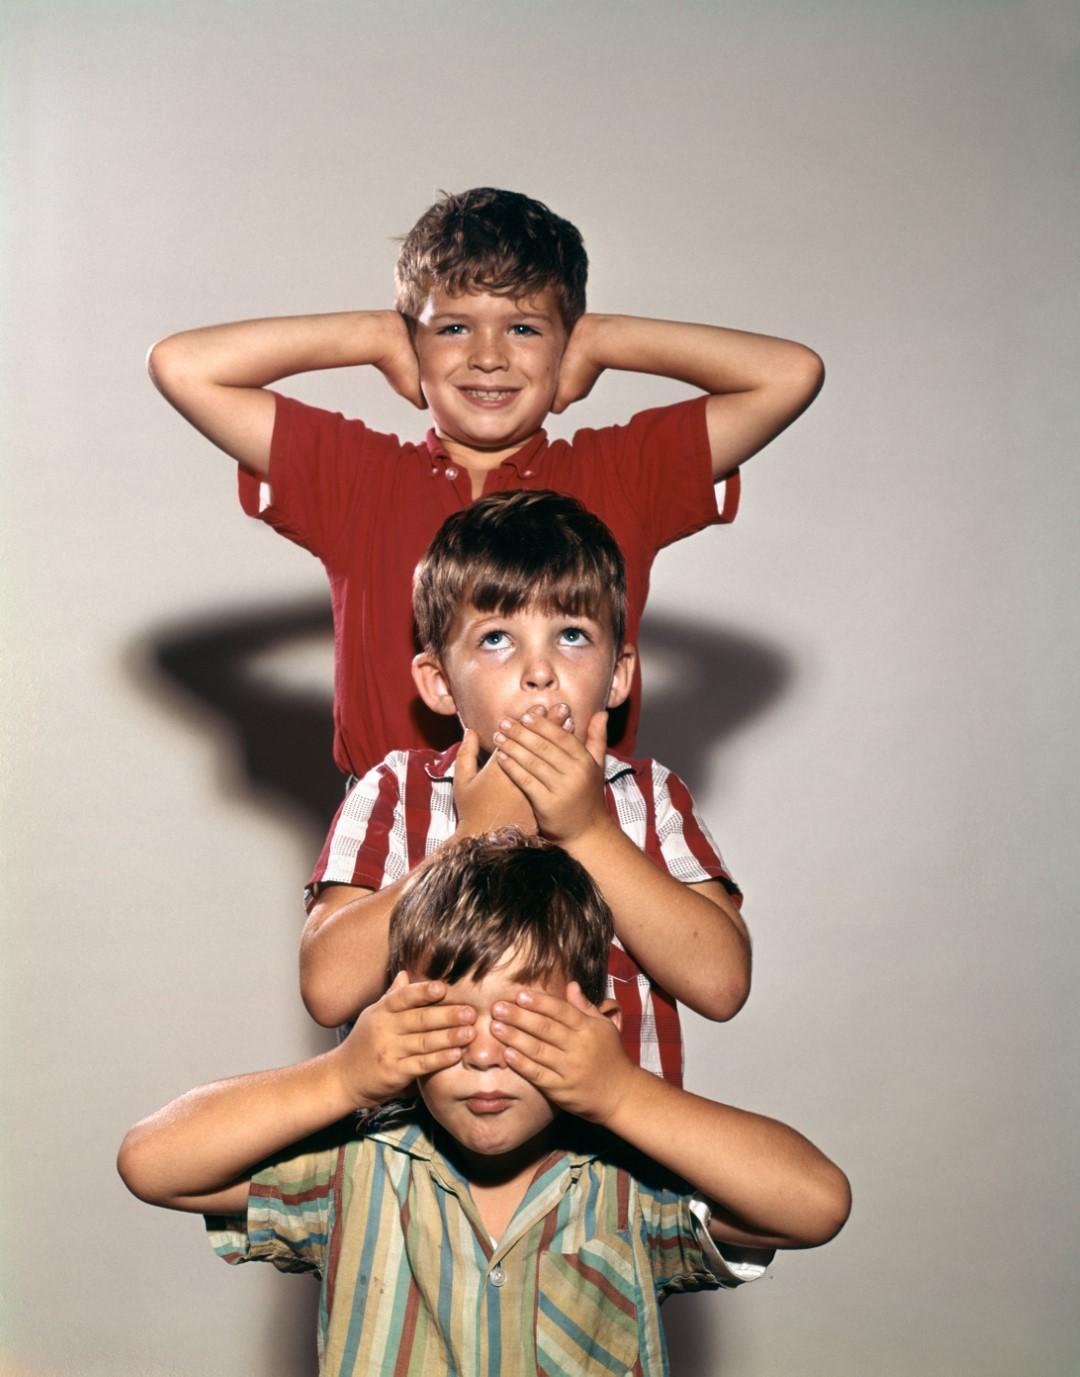 BRA2M3 1960s BOYS POSING AS THREE WISE MONKEYS SEE NO EVIL HEAR NO EVIL SPEAK NO EVIL SYMBOLIC STORY